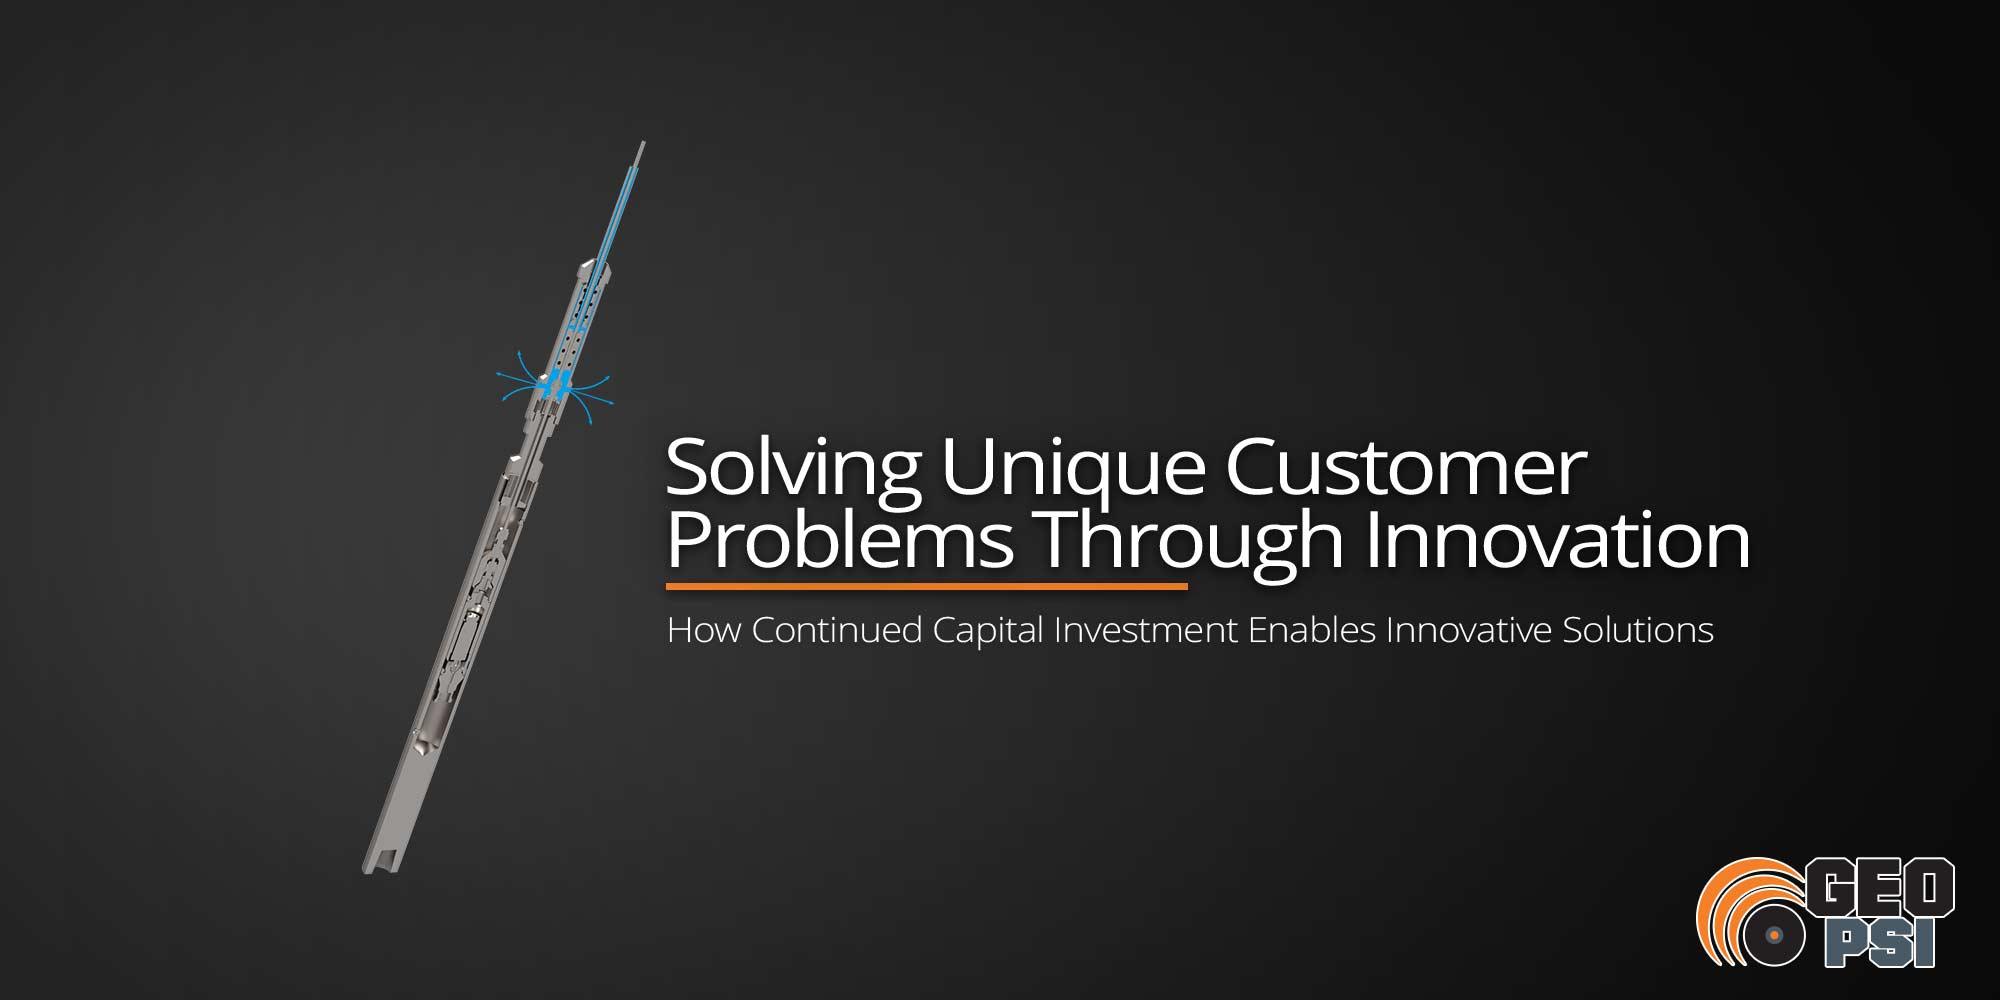 Solving Unique Customer Problems Through Innovation